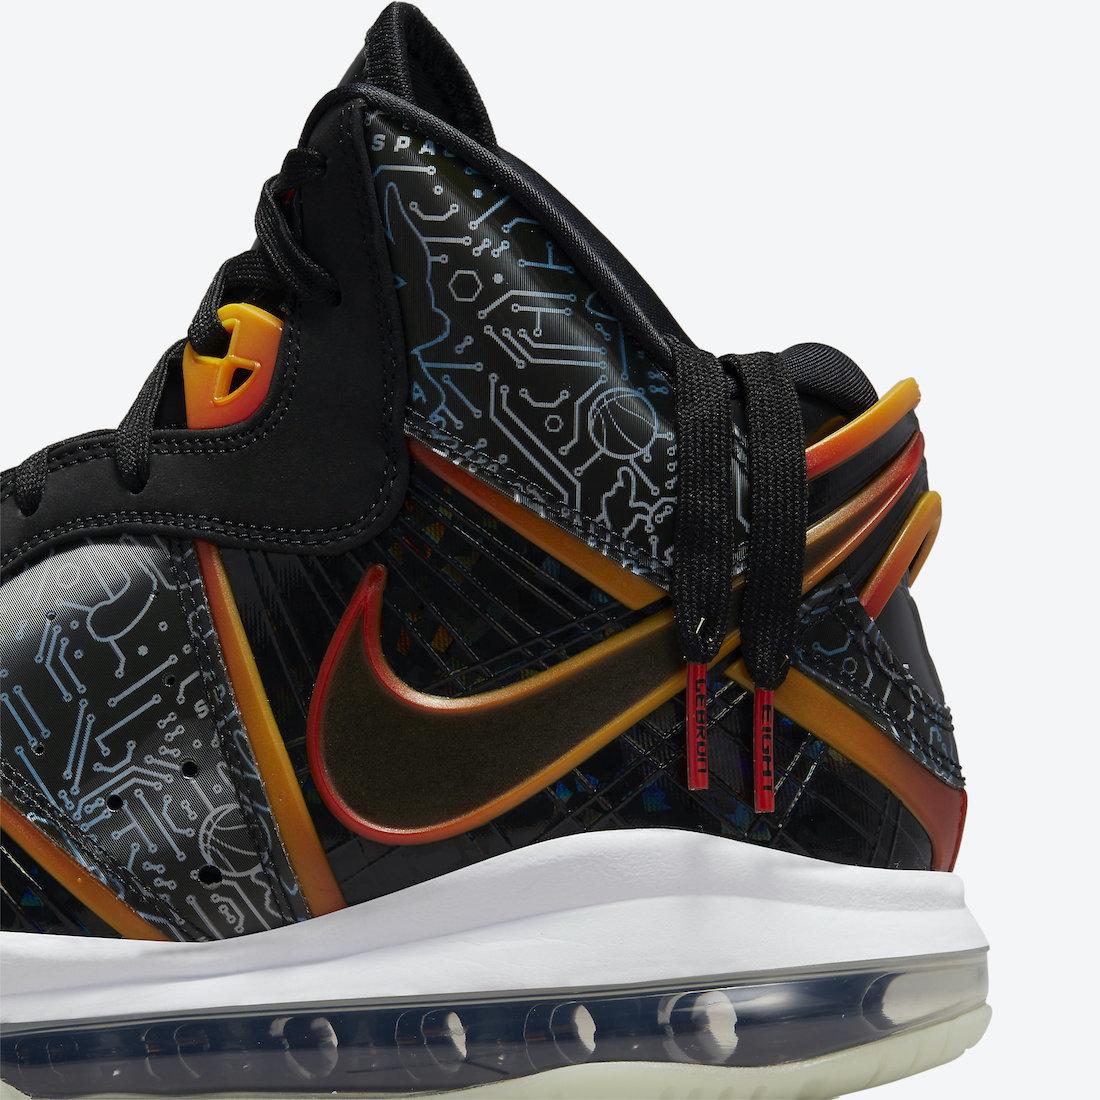 Nike-LeBron-8-Space-Jam-DB1732-001-Release-Date-14